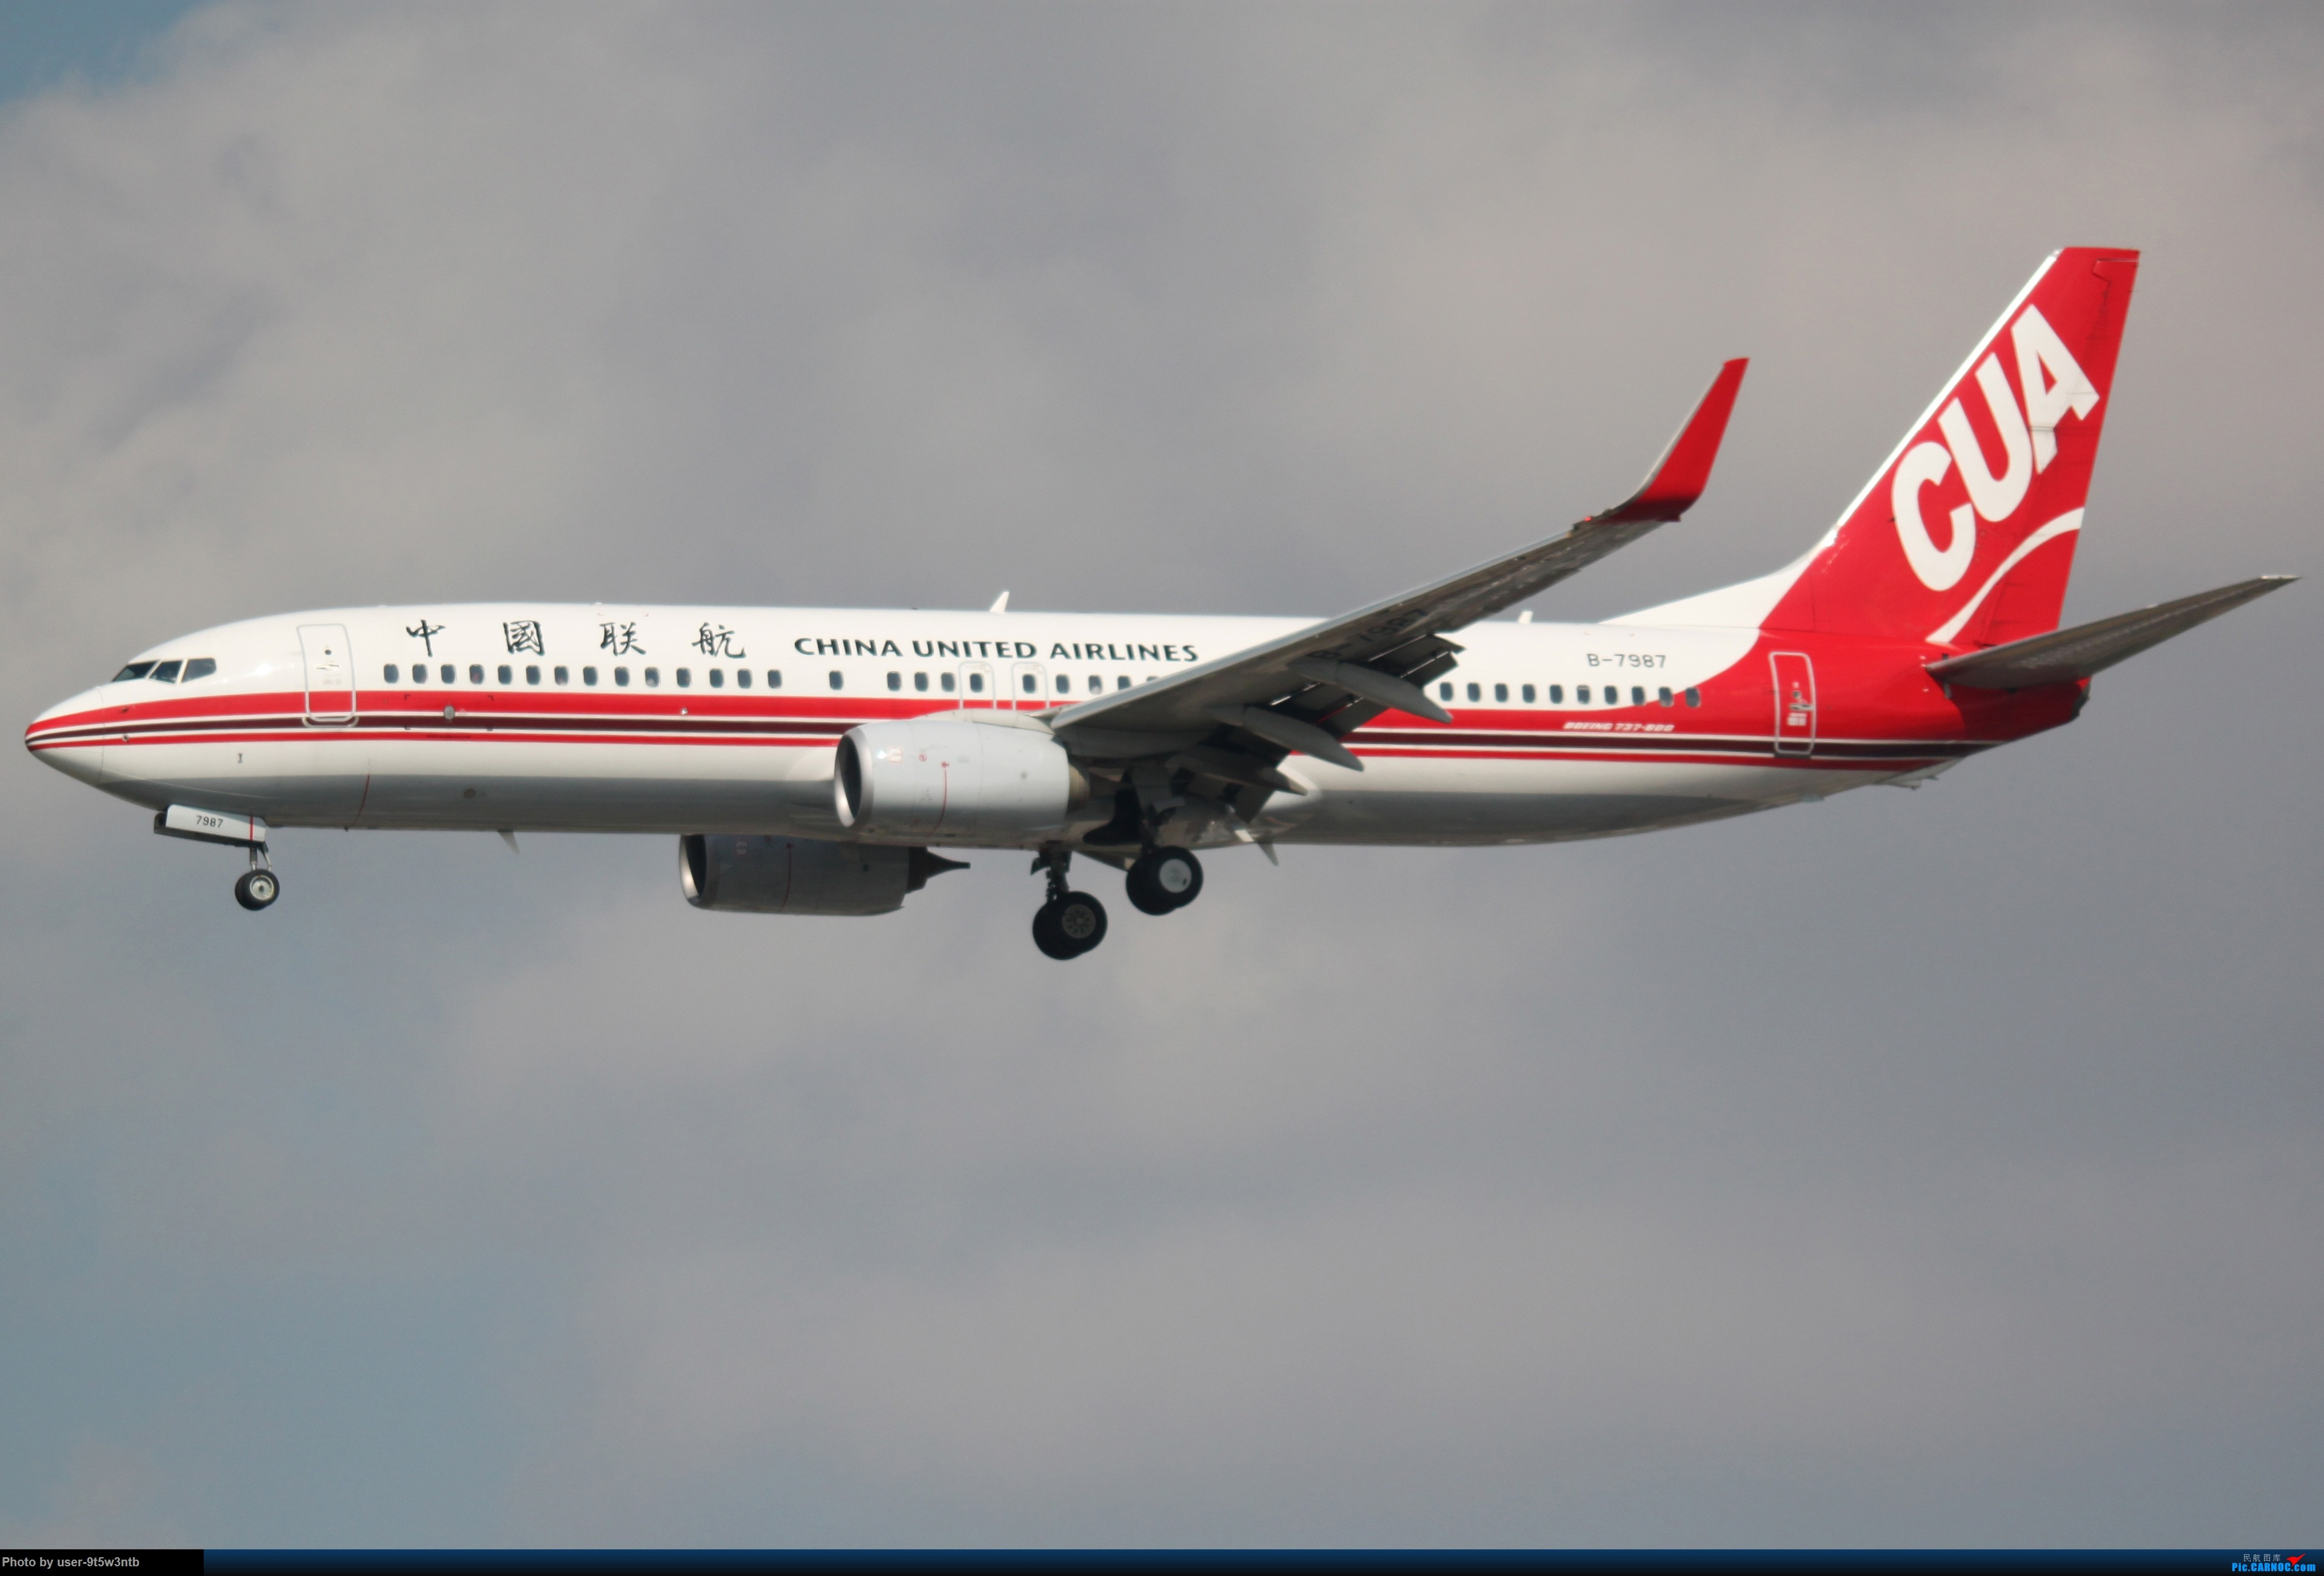 Re:[原创]虹桥机场炎热的早晨 BOEING 737-800 B-7987 中国上海虹桥国际机场